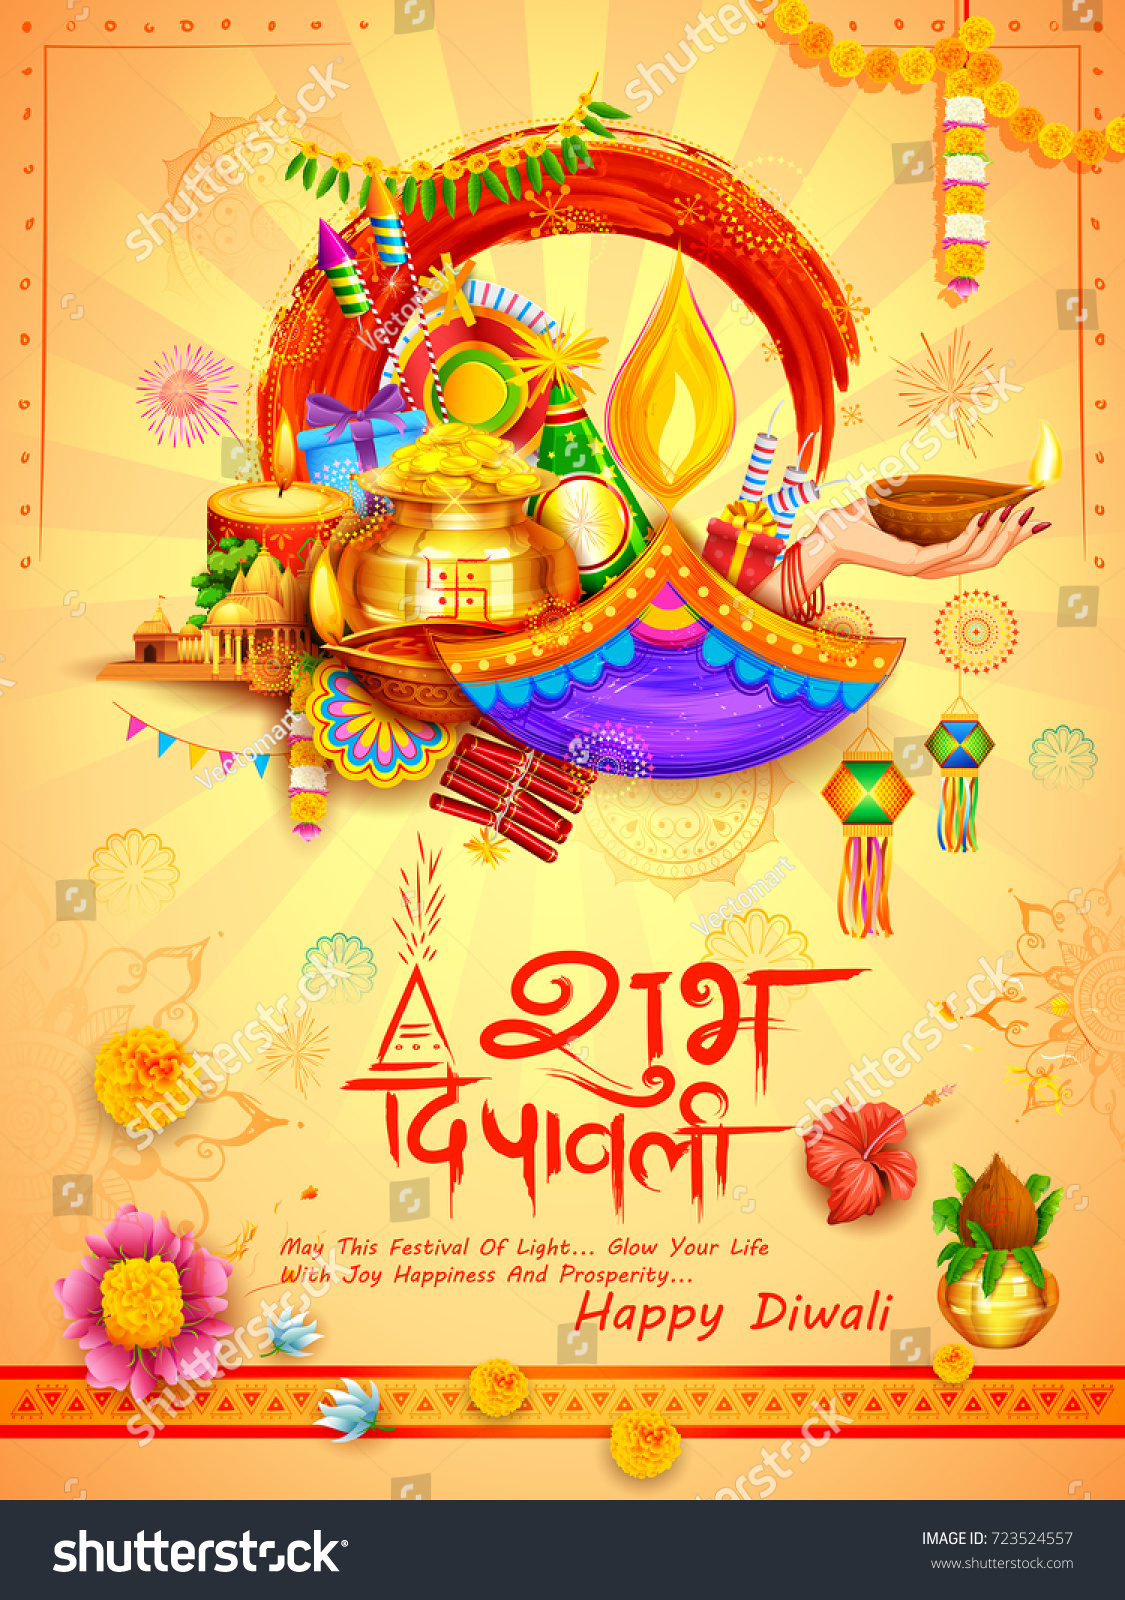 Illustration Of Burning Diya On Diwali Holiday Background For Light